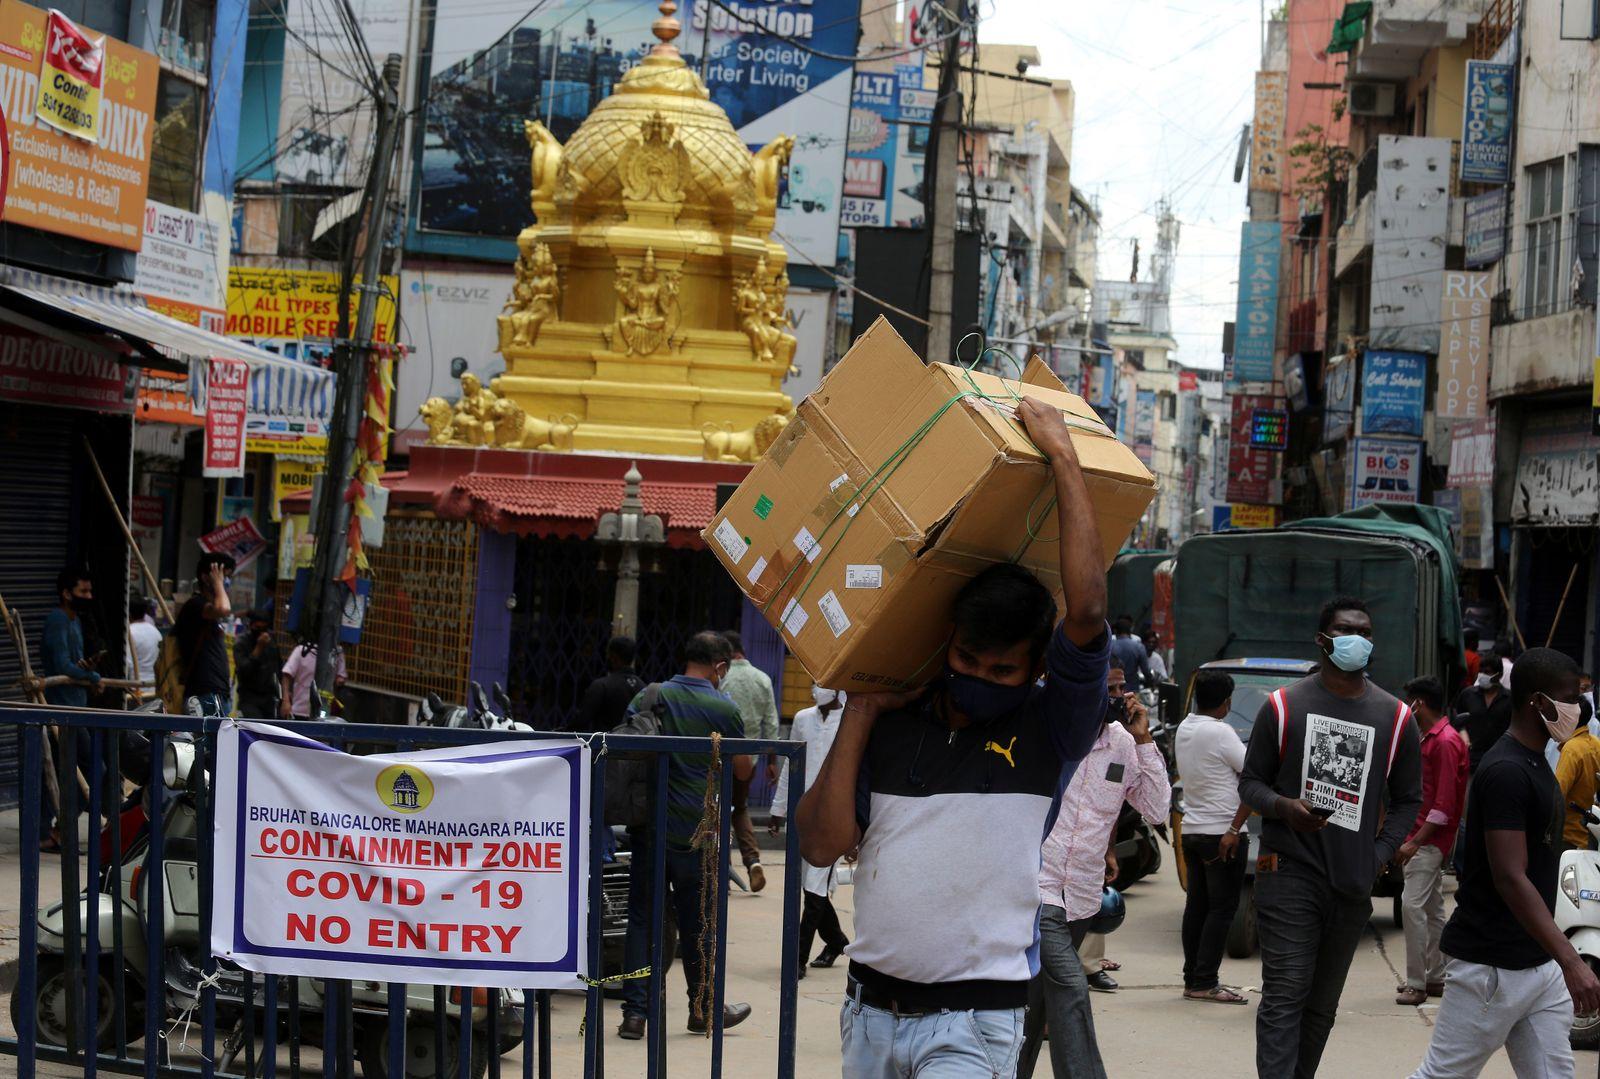 Extended lockdown in Bangalore due to Coronavirus, India - 28 Jul 2020